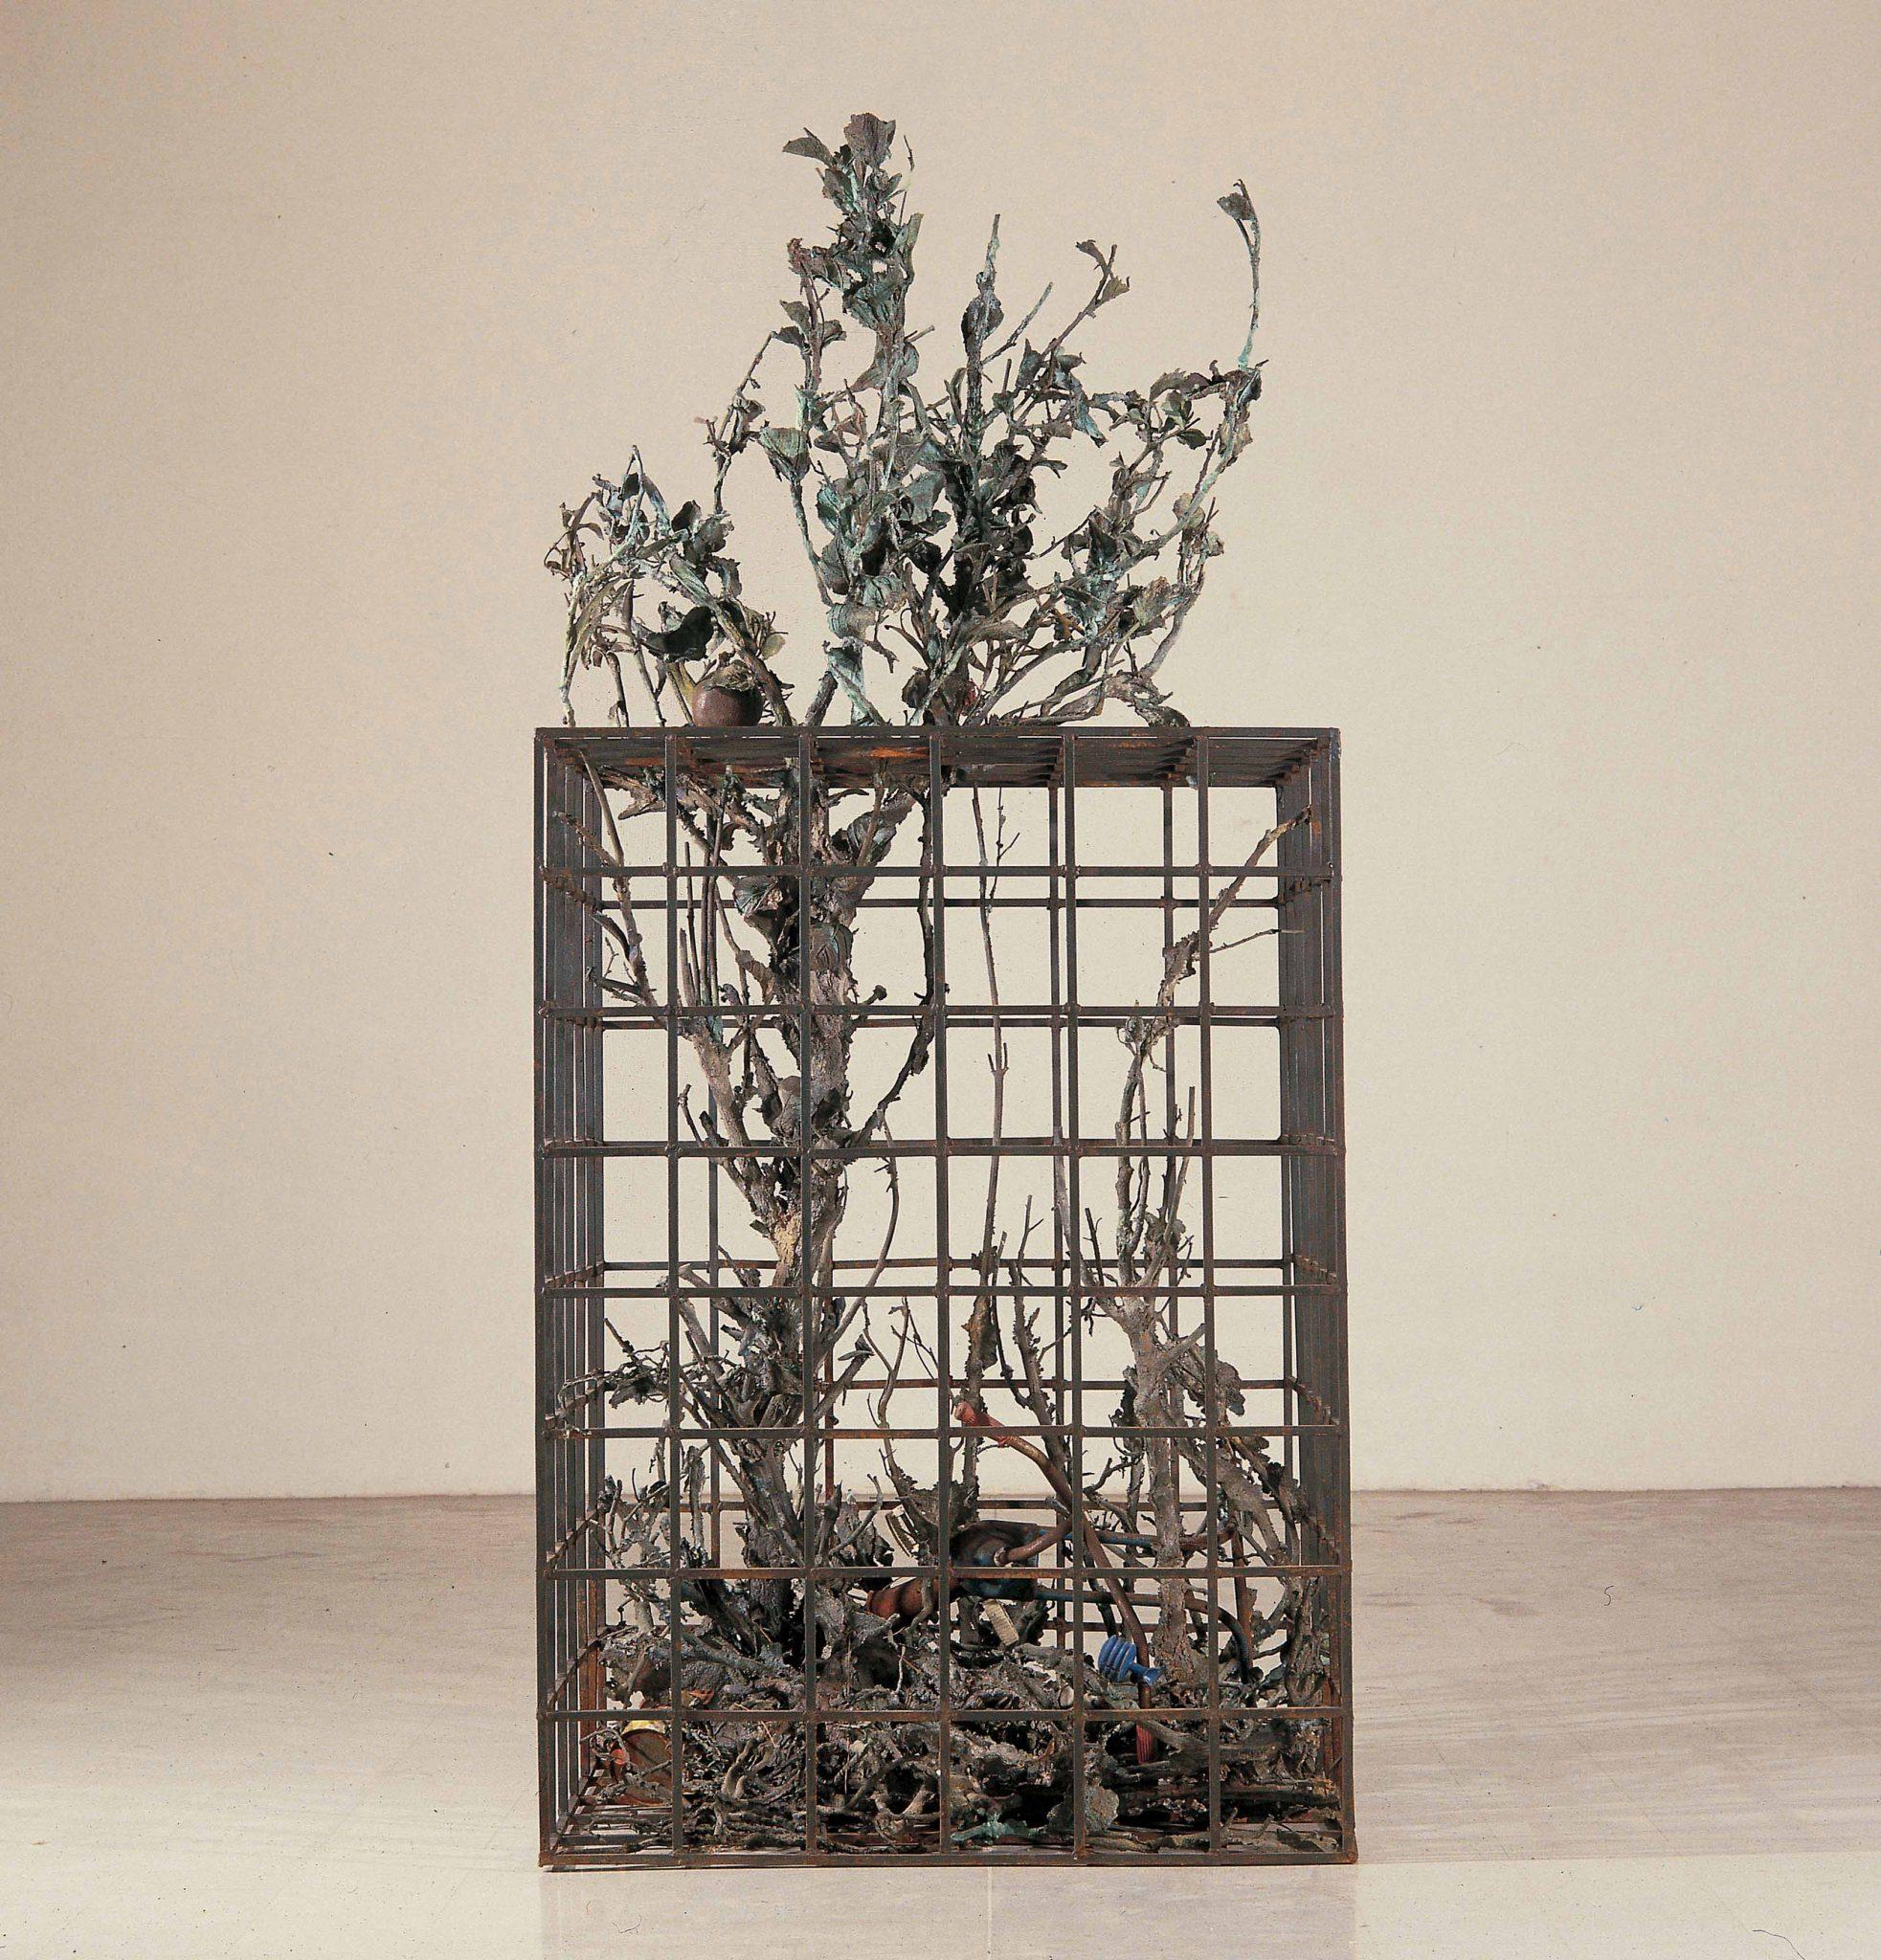 Alik Cavaliere W la libertà, 1976-1977 bronzo, cm 227x105x103 - Gallerie d'Italia